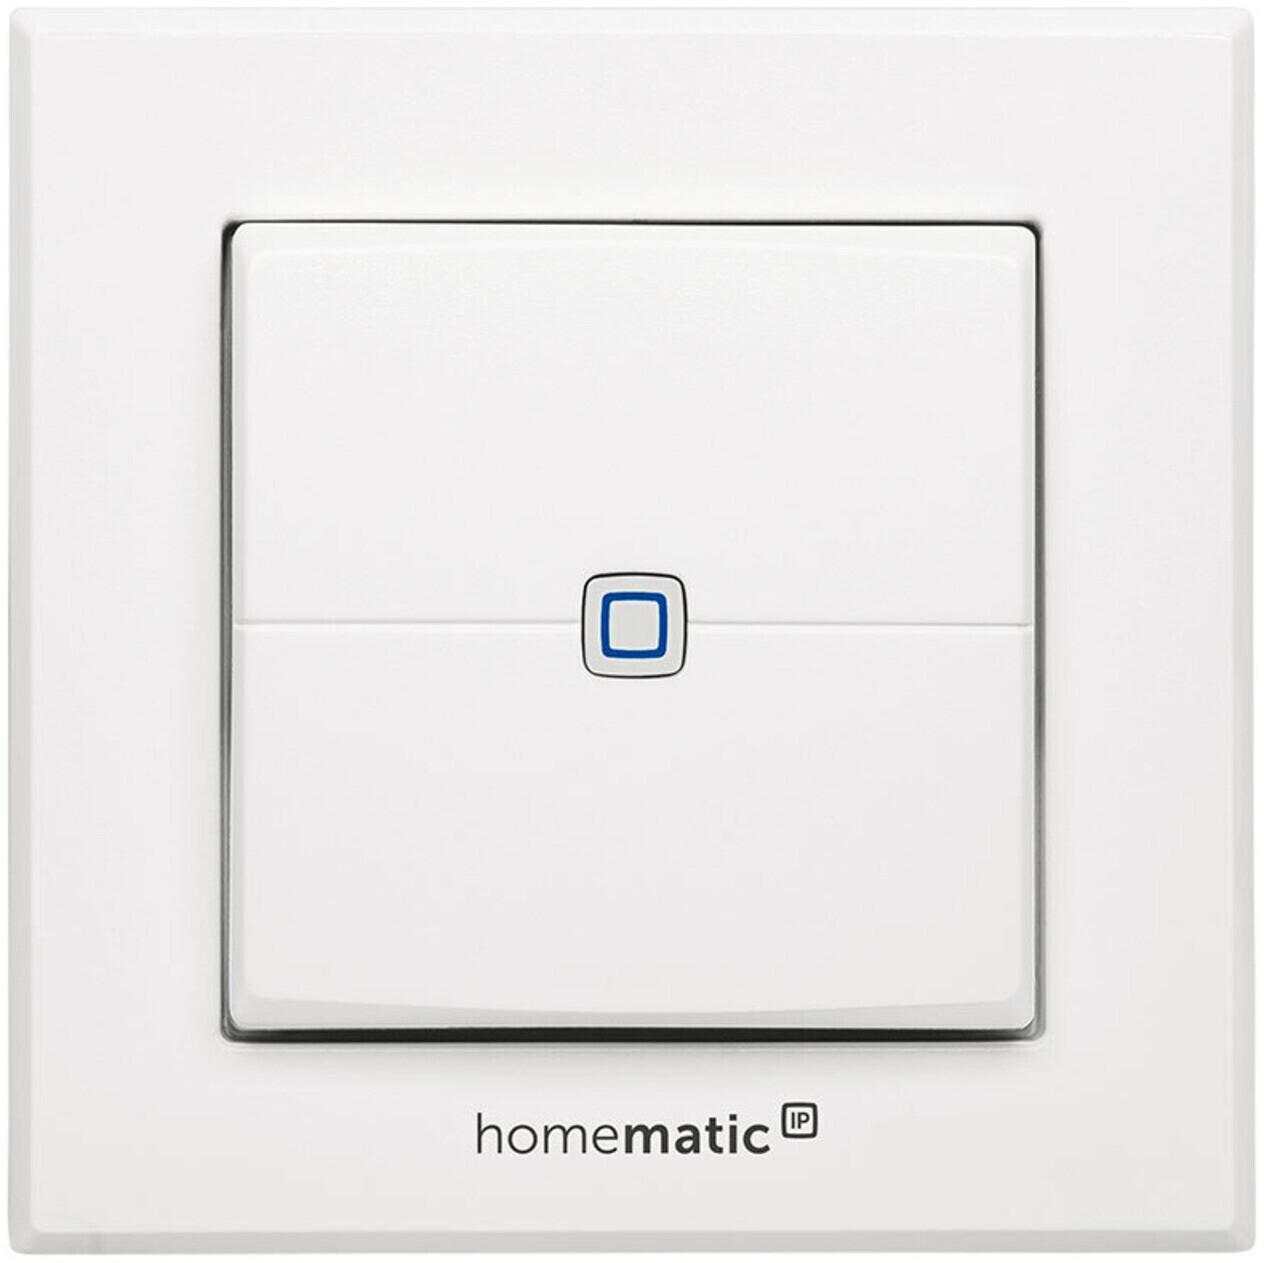 Homematic IP Wandtaster - 2-fach (HMIP-WRC2)